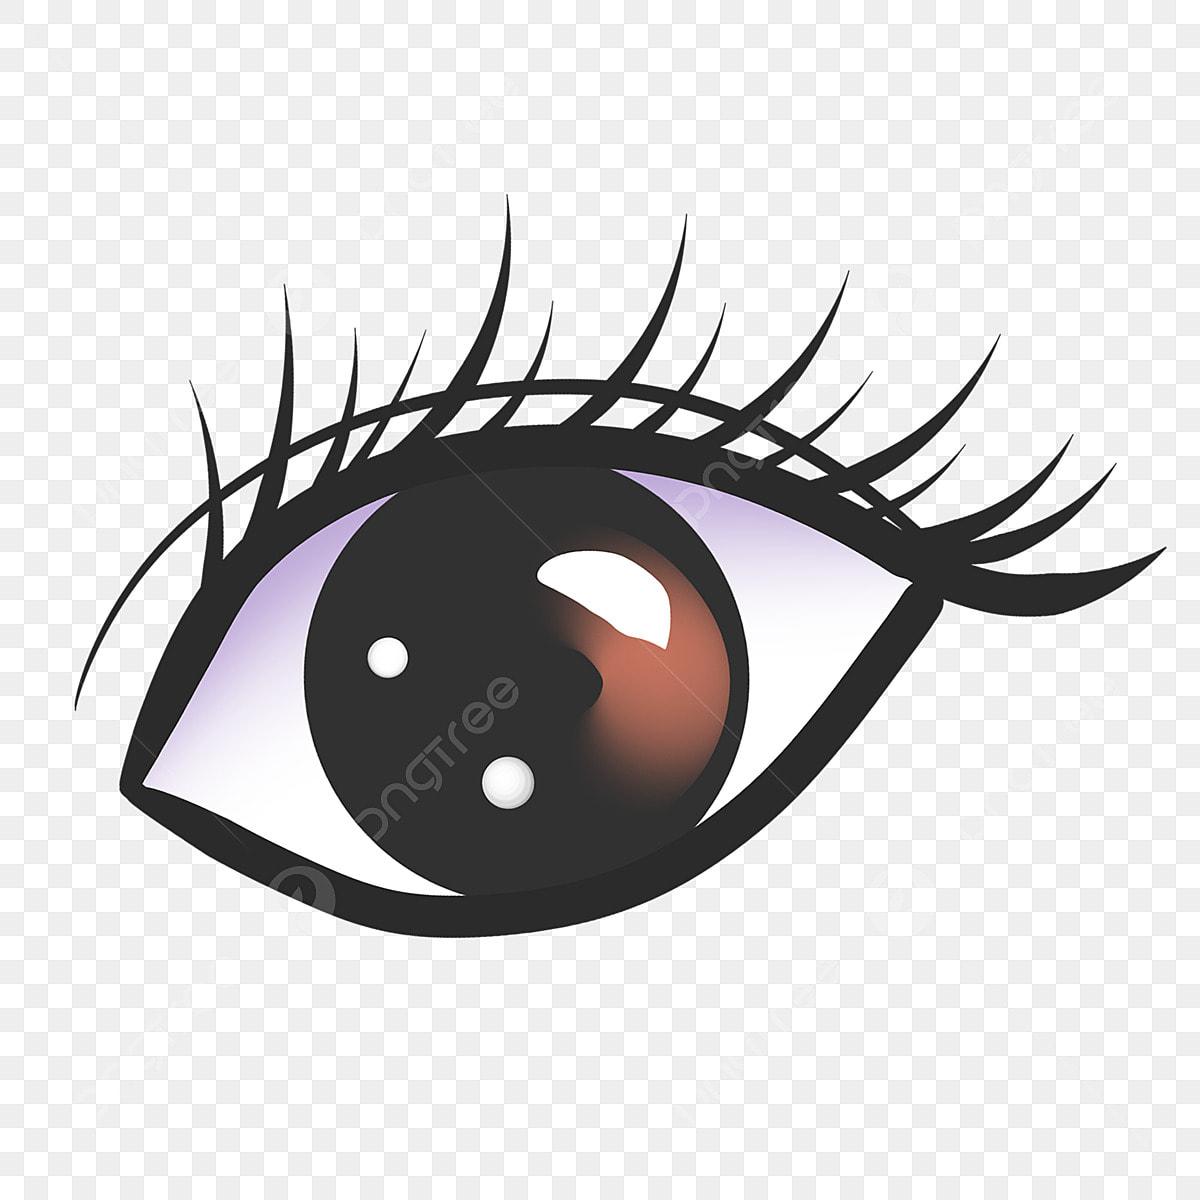 Beautiful Eye Long Eyelashes Illustration Big Eyes Long Eyelashes Eyelashes Png Transparent Clipart Image And Psd File For Free Download